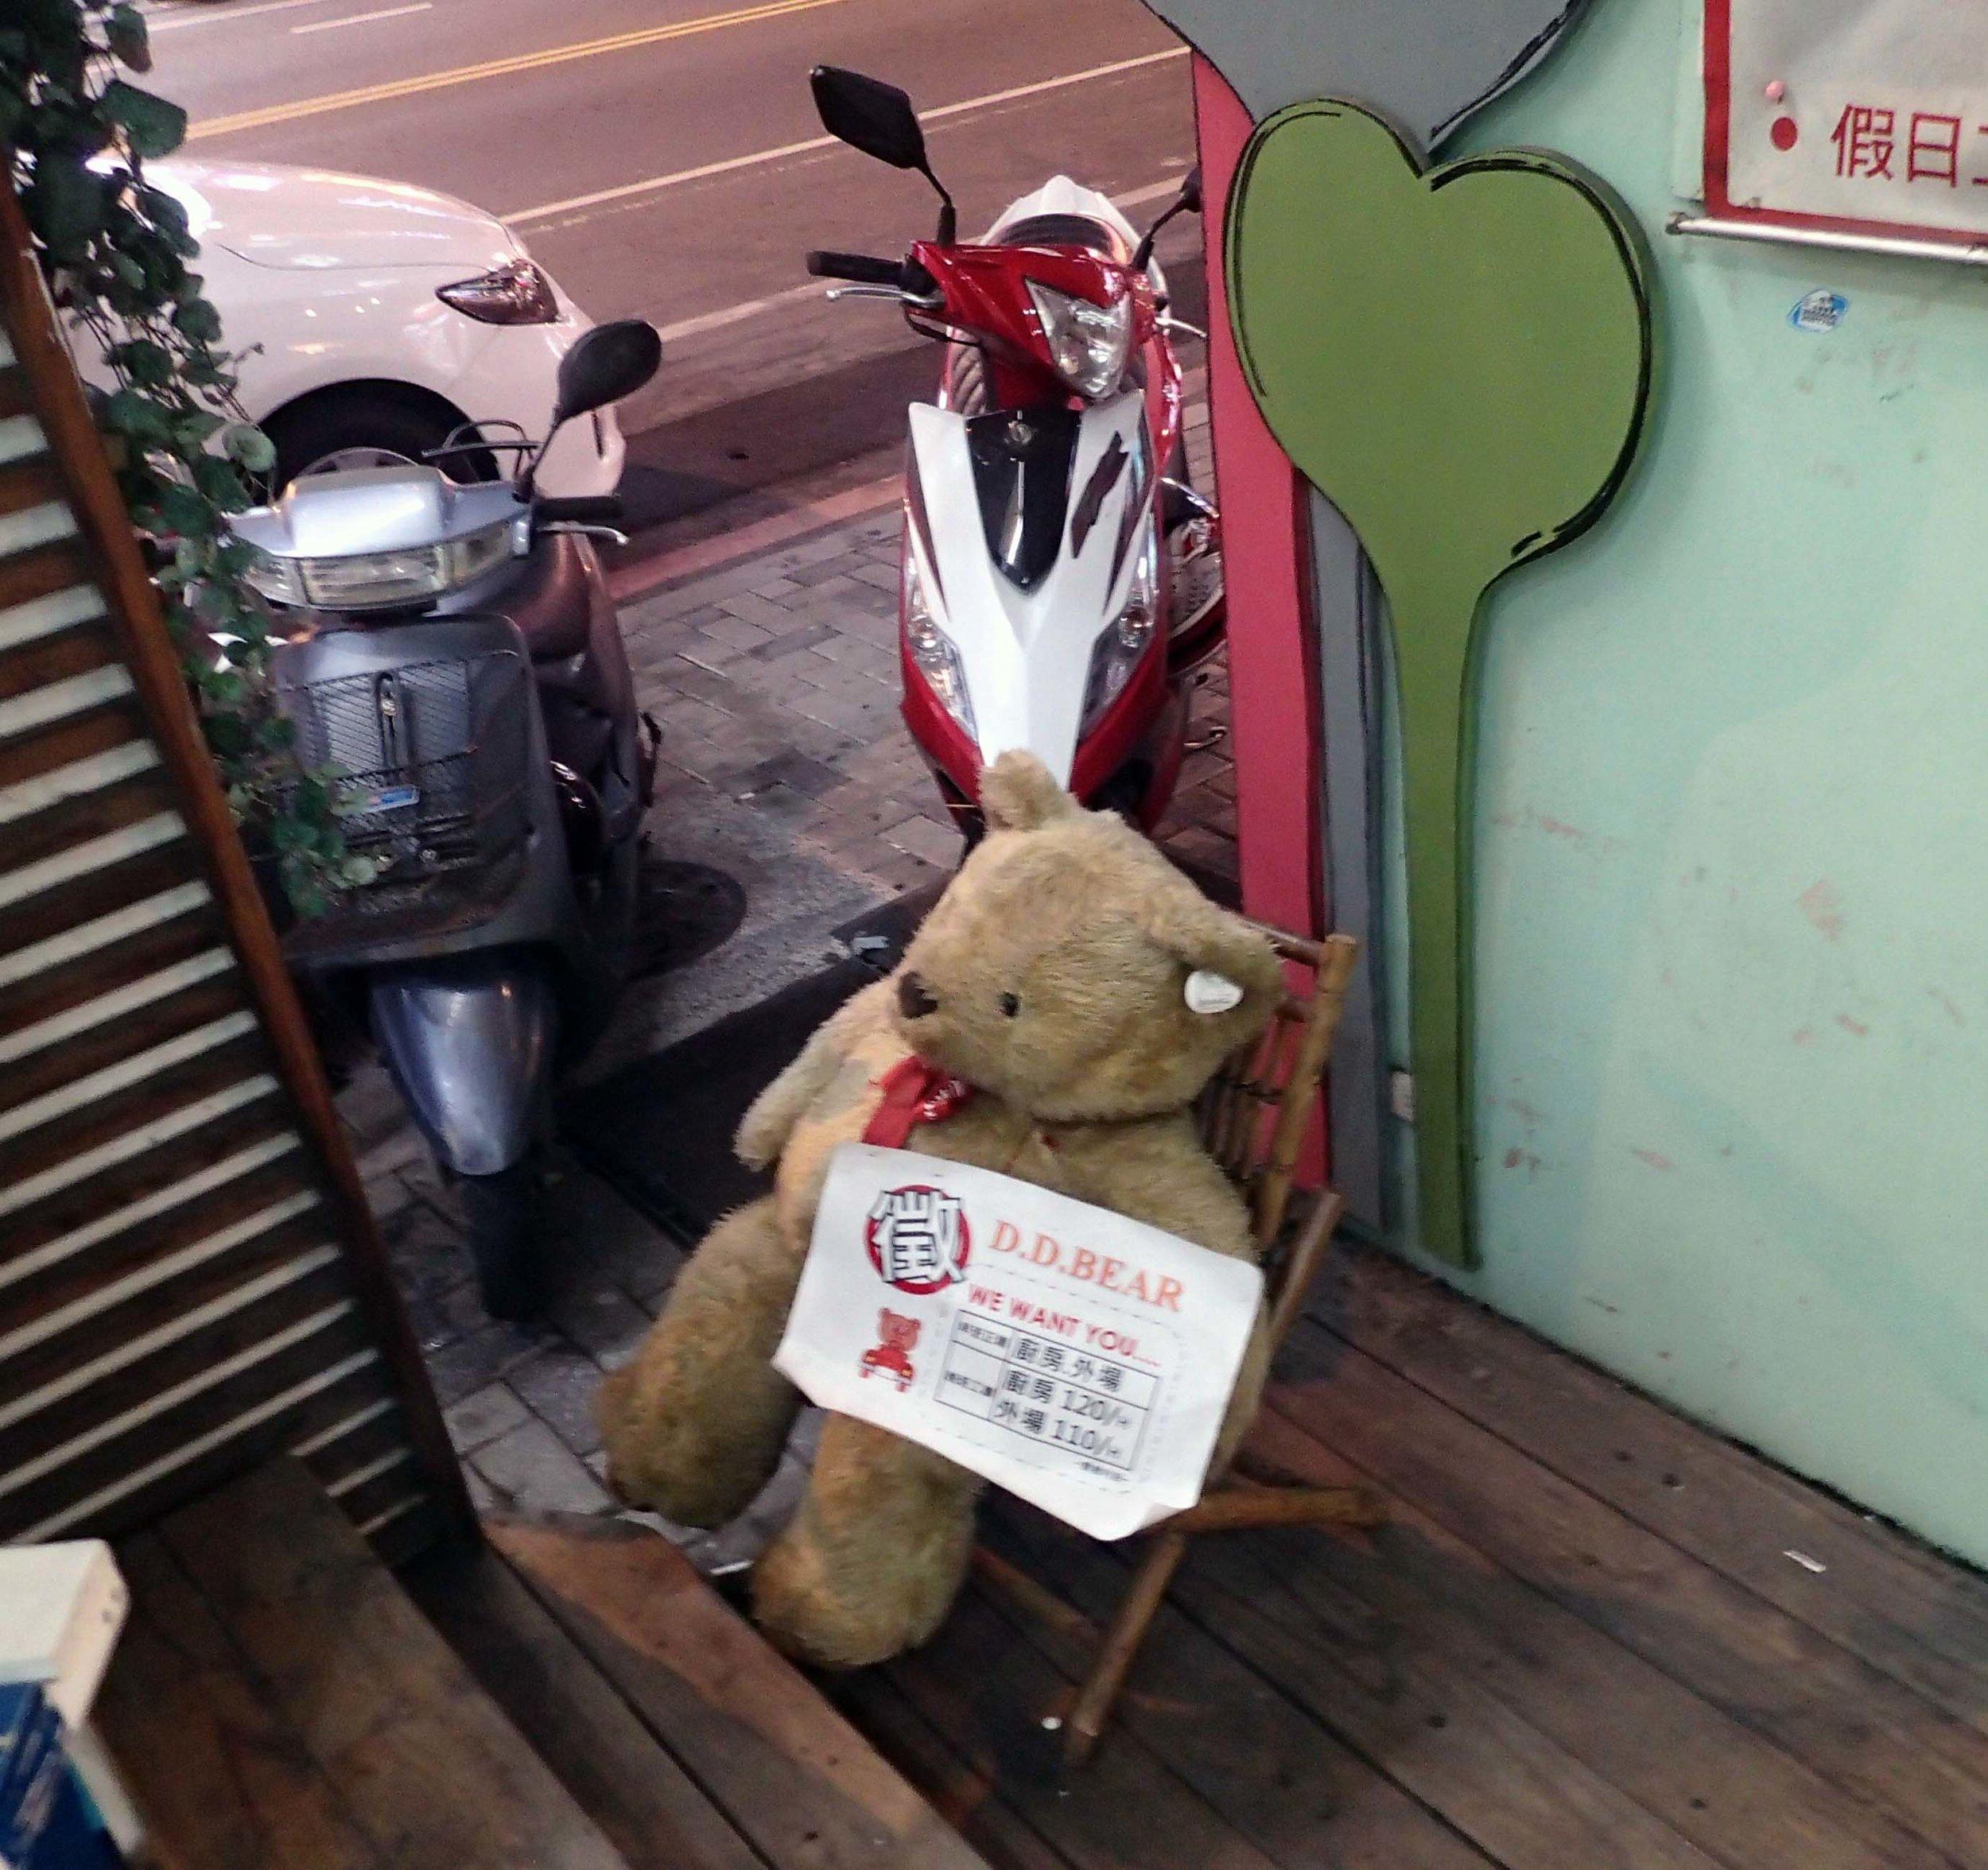 DD Bear.jpg